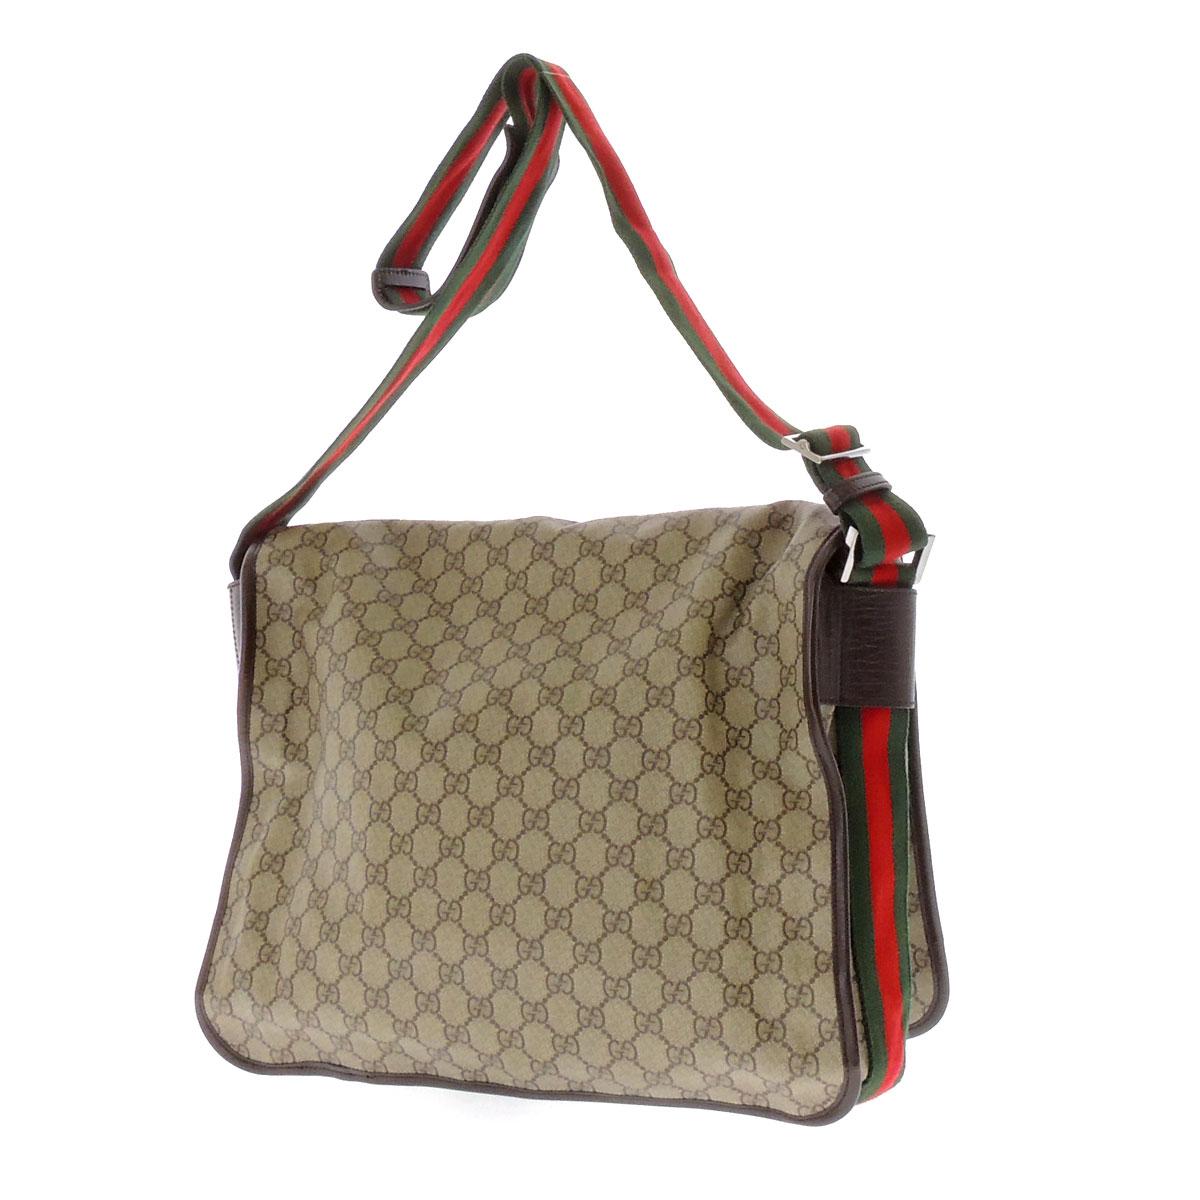 GUCCI tiny GG pattern shoulder bag PVCx leather unisex